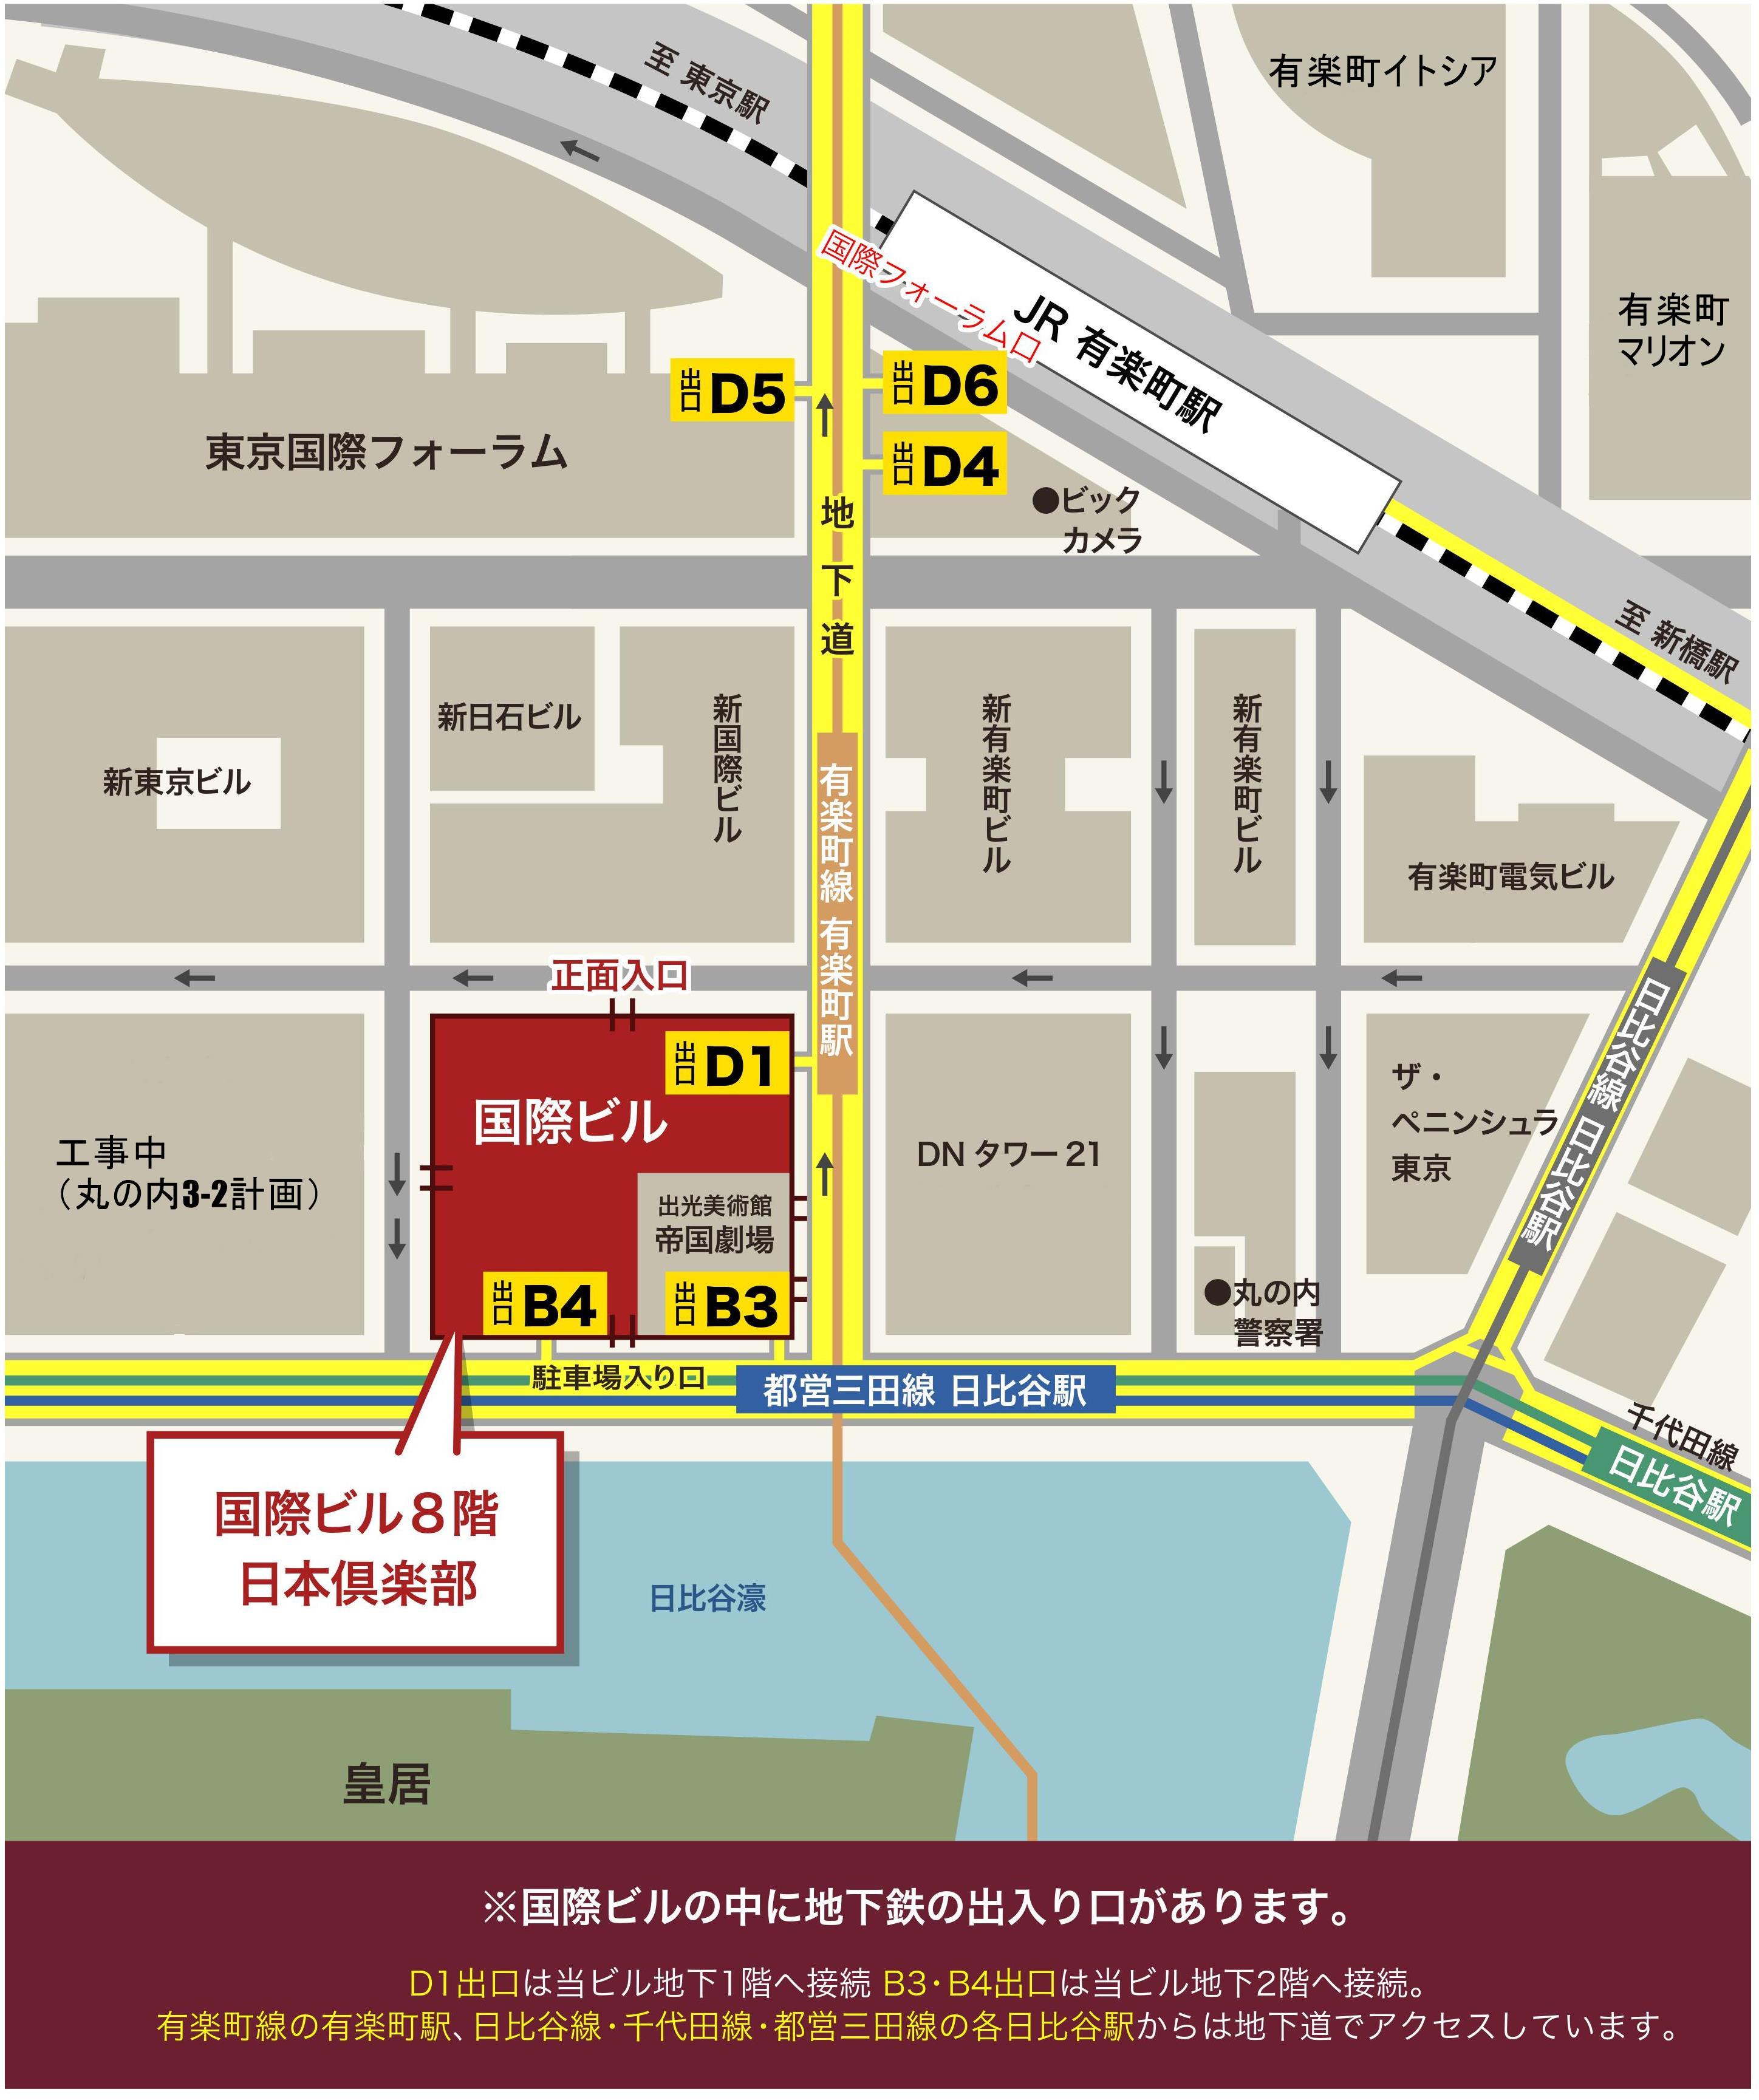 http://nihonclub.top-page.jp/user/filer_public/a4/63/a463f3b4-e95d-4290-9343-2c872c35ec44/ri-ben-ju-le-bu-henojiao-tong-akusesuh28629.jpg